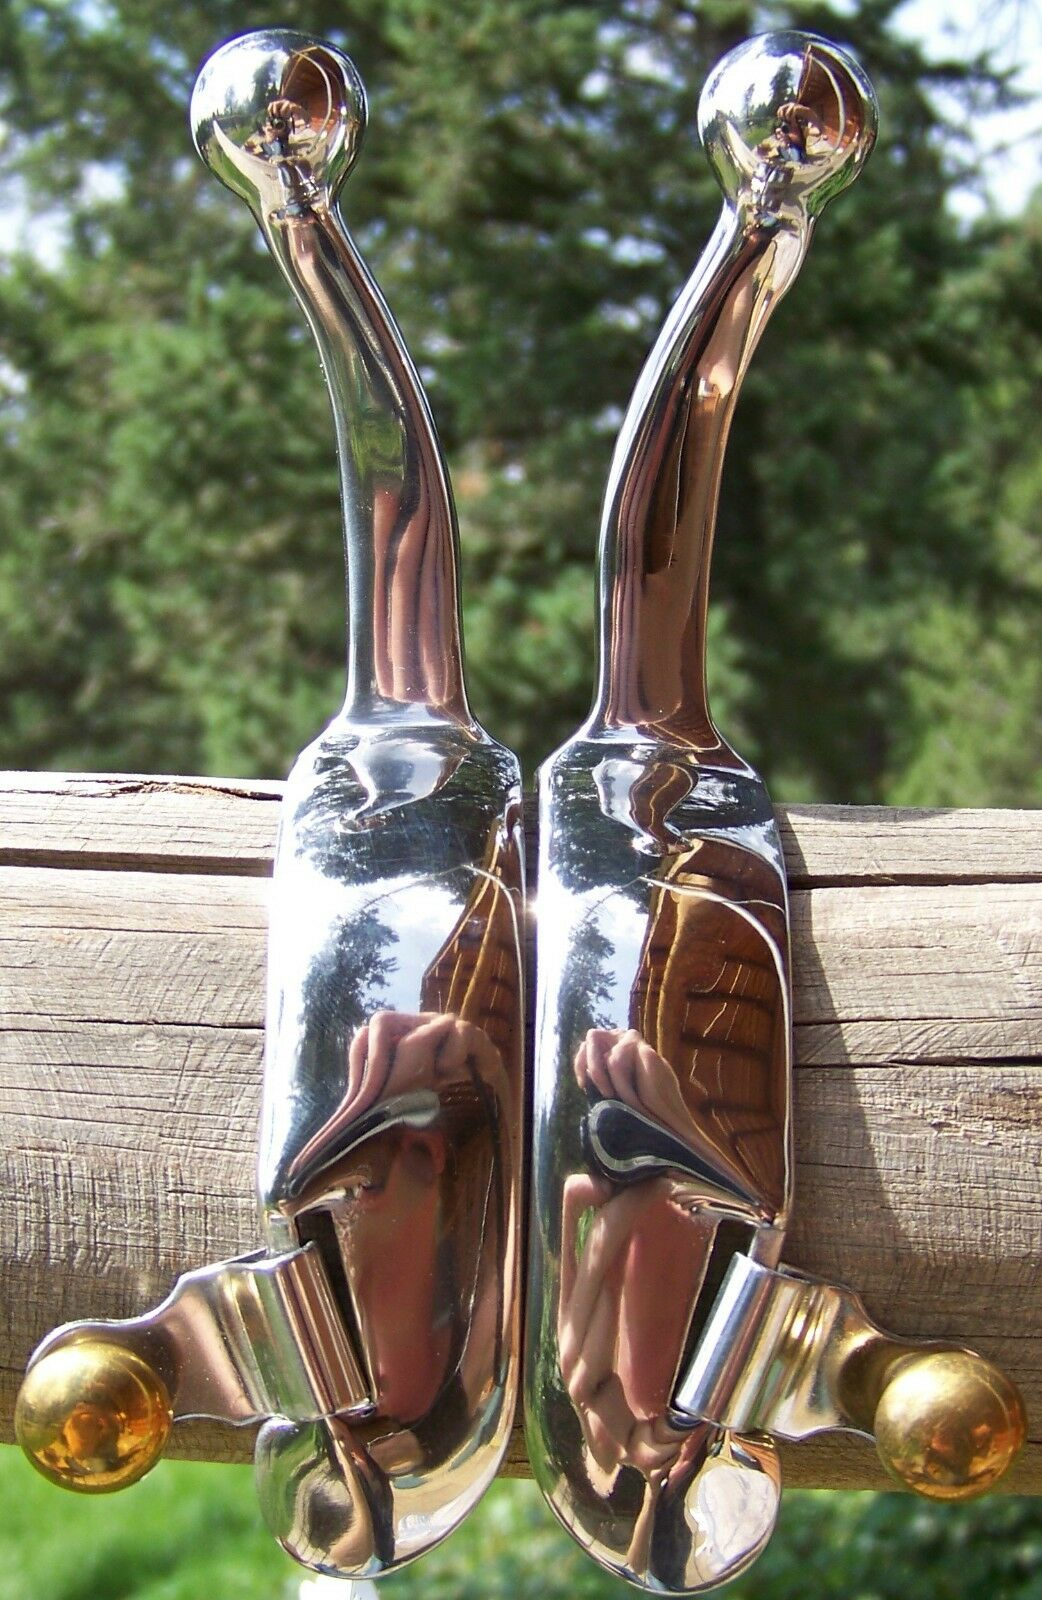 Spurs - Stainless Steel Humane (Ladies)